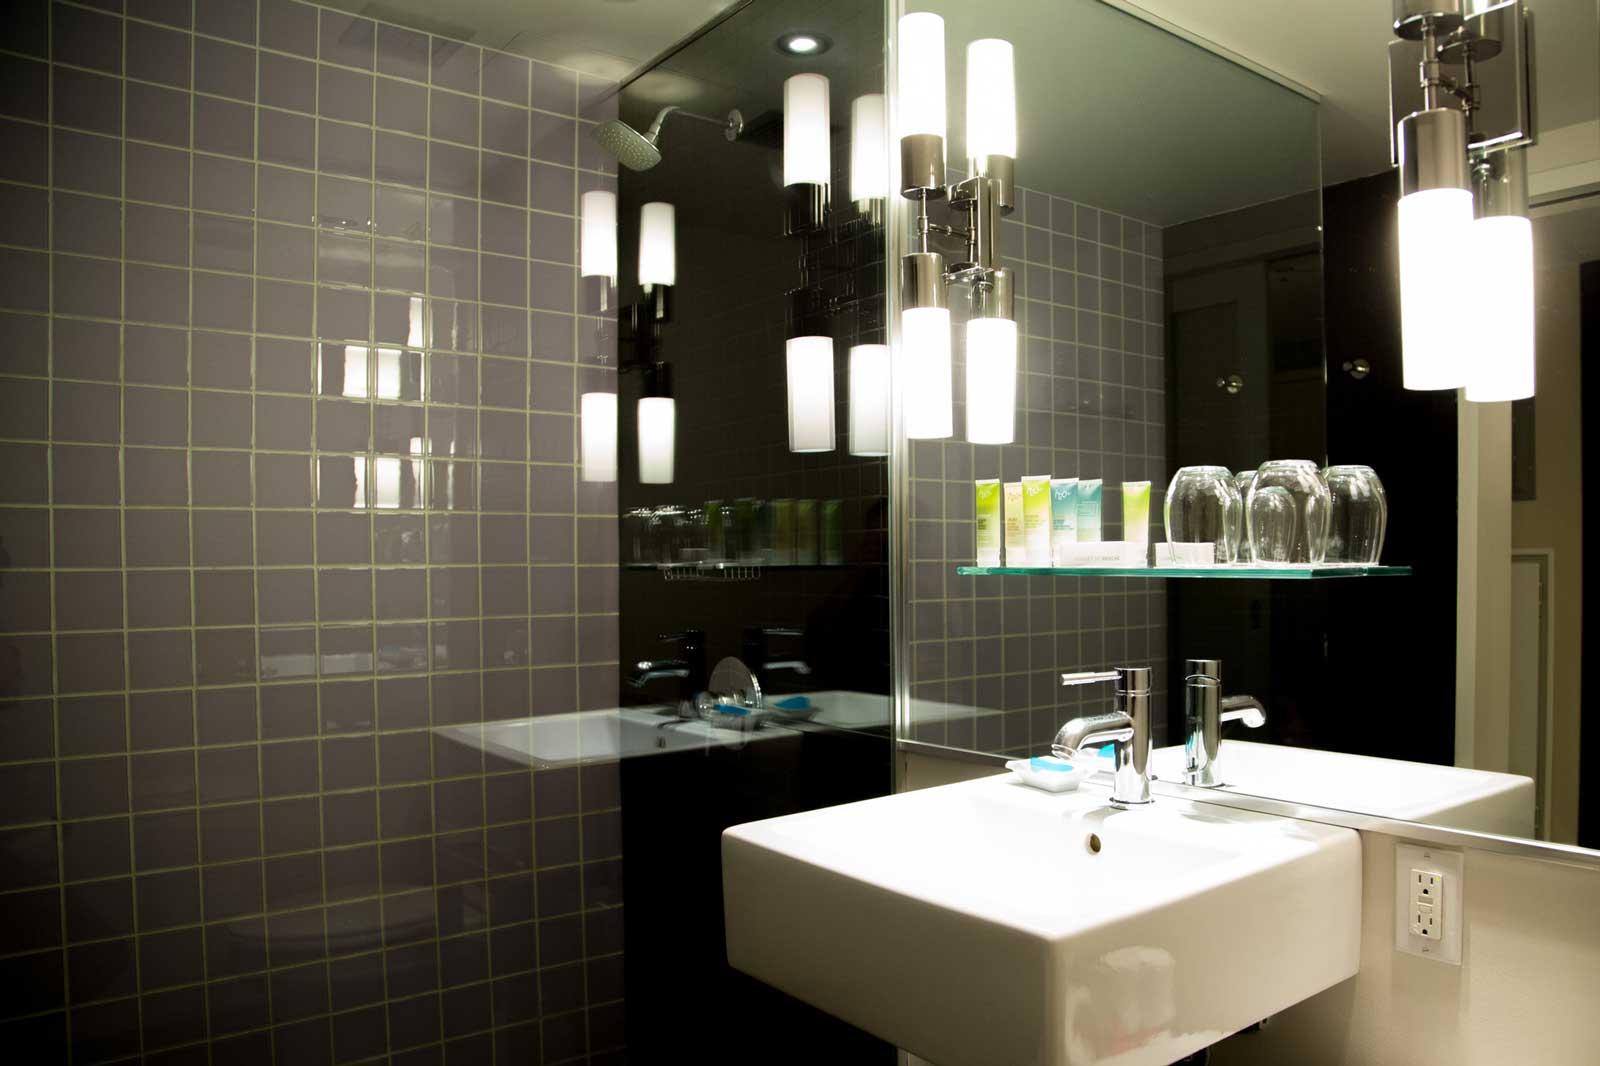 Hotel-10-Montreal-Stenberg-0298.jpg